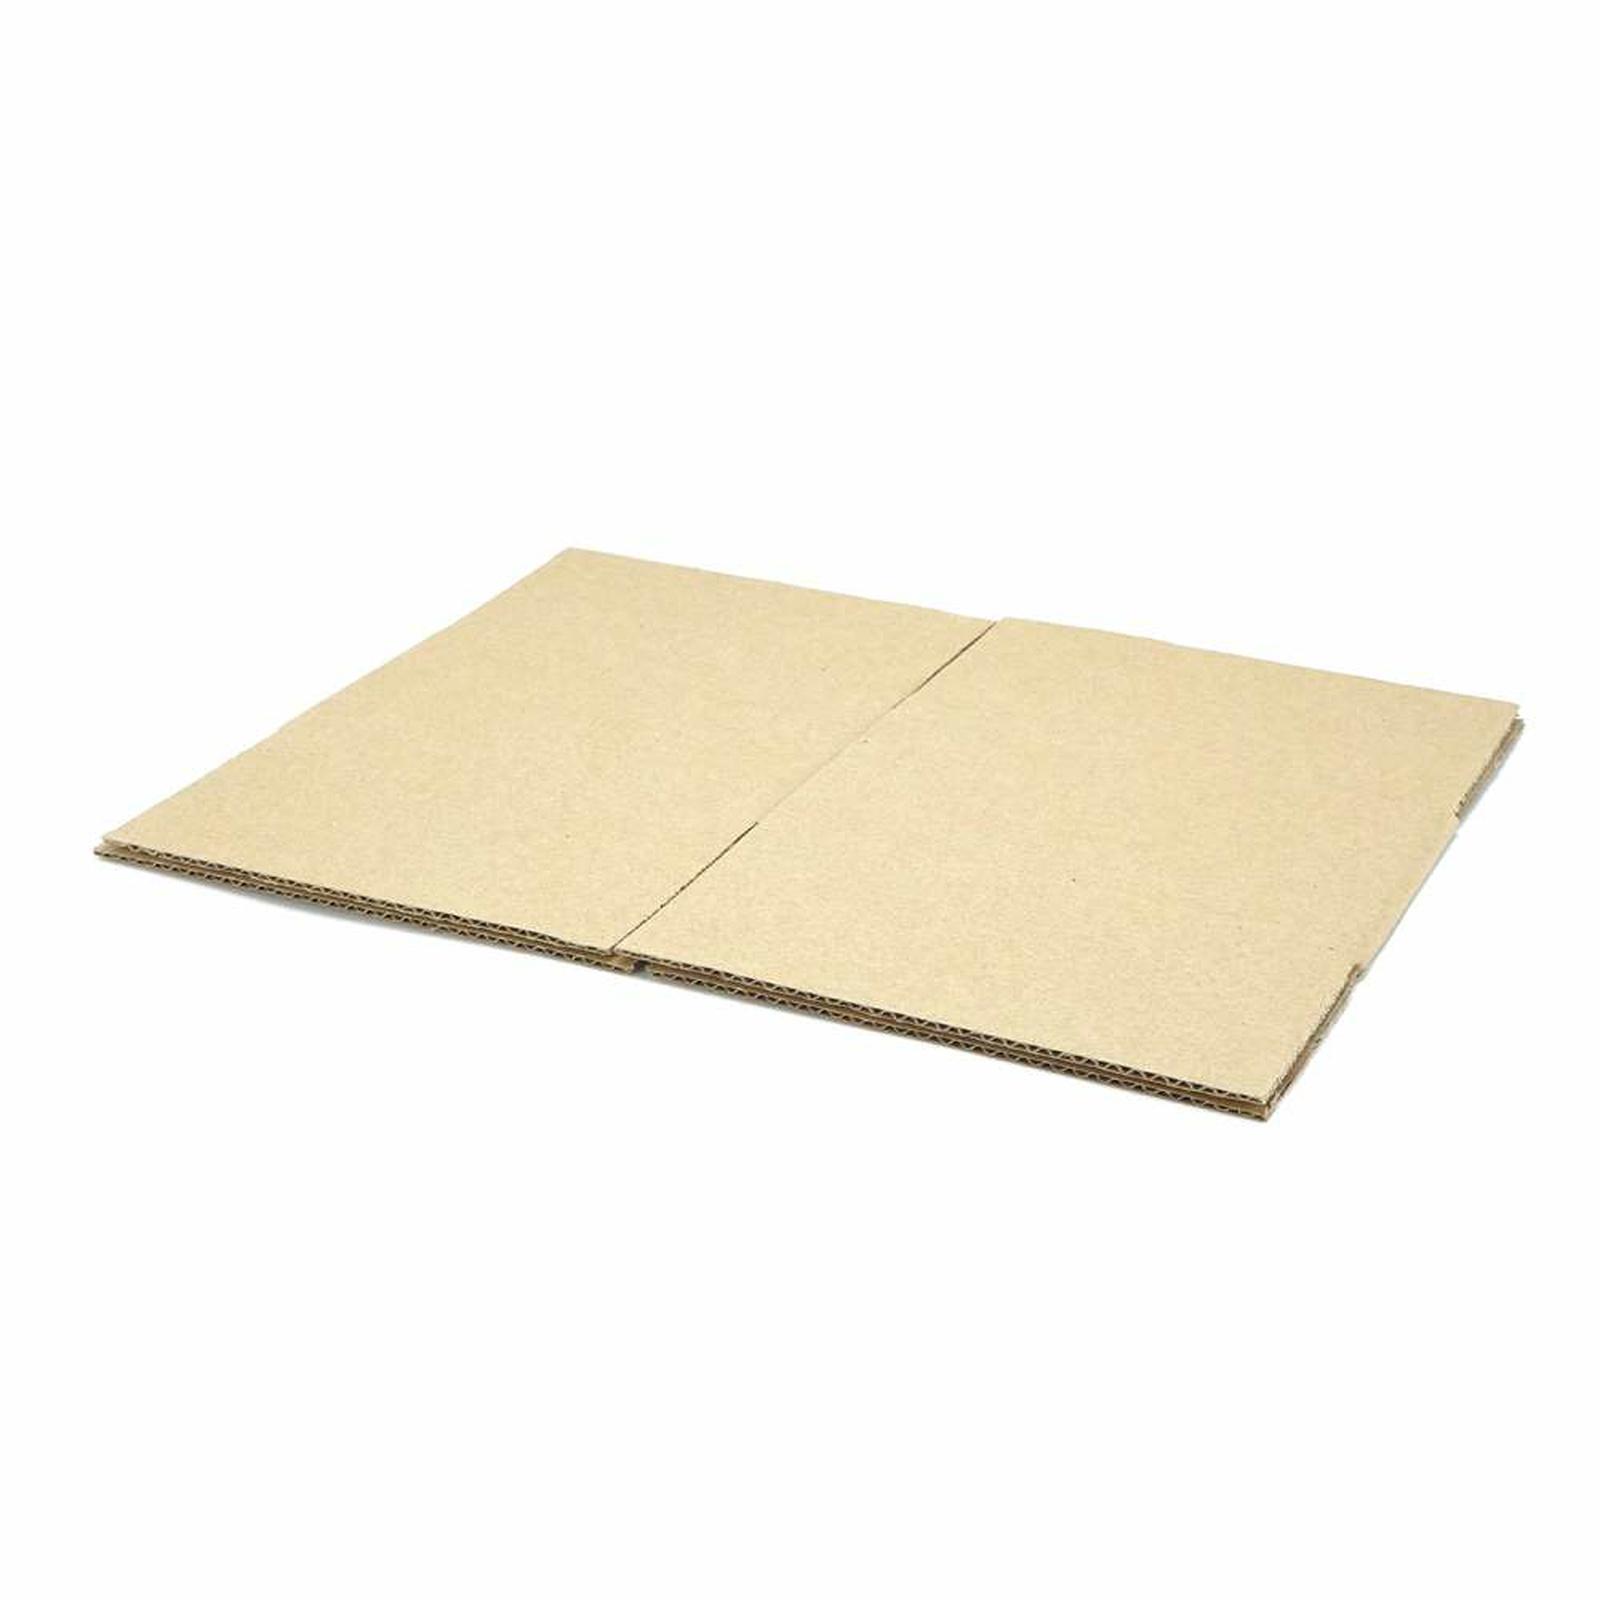 einwellige kartons 190x180x100 mm g nstig kaufen 0 20. Black Bedroom Furniture Sets. Home Design Ideas